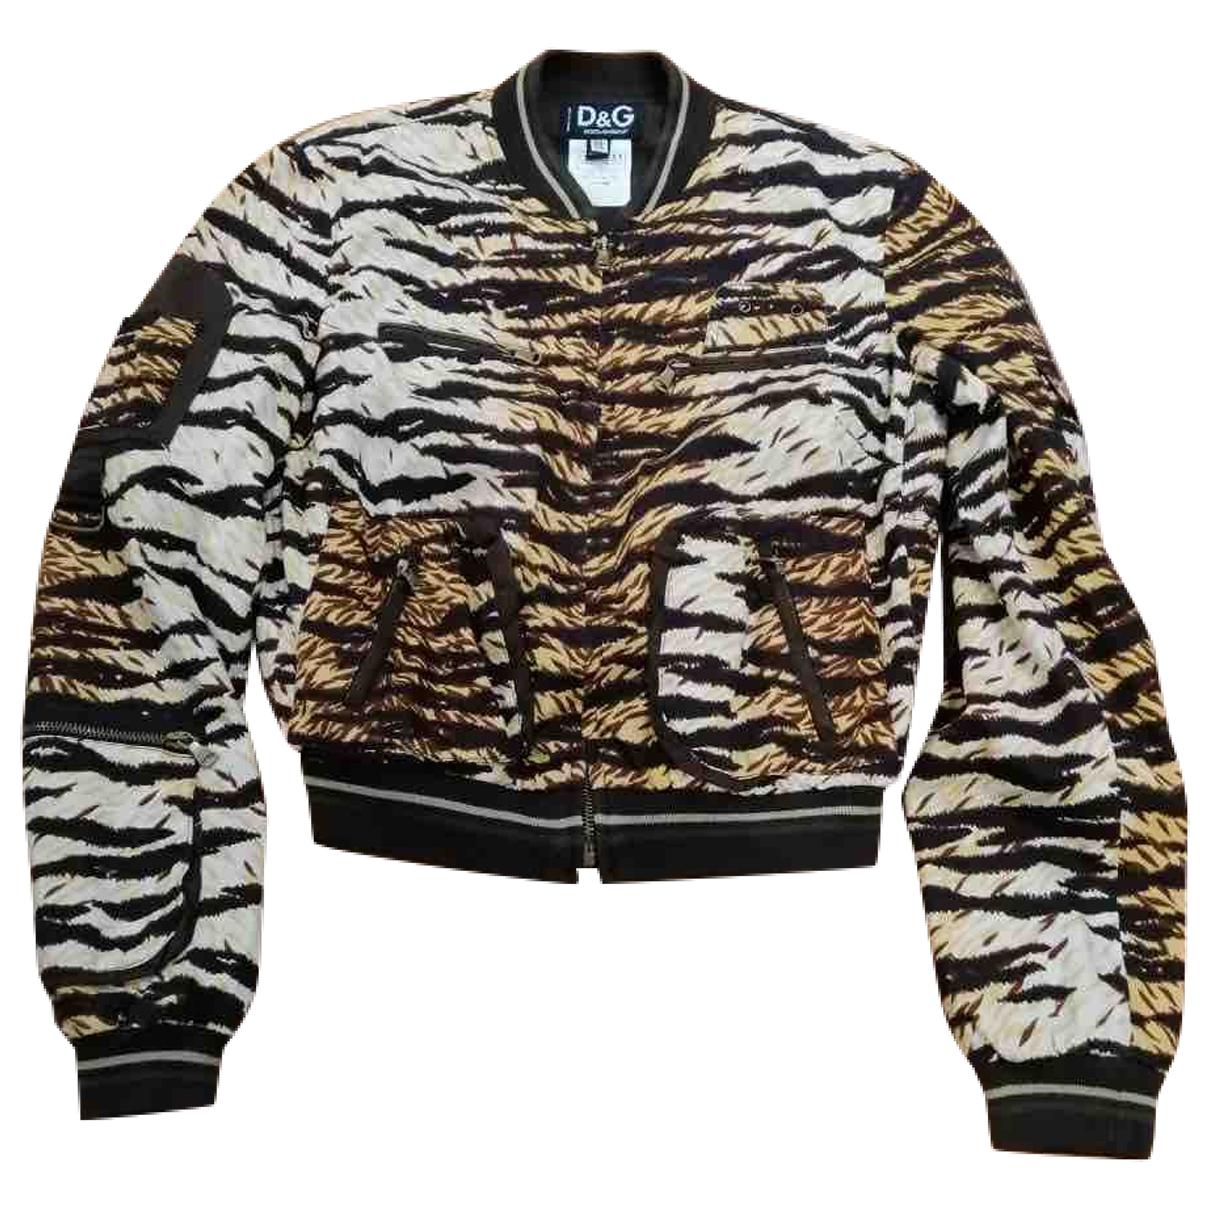 D&g \N Cotton jacket for Women 42 IT